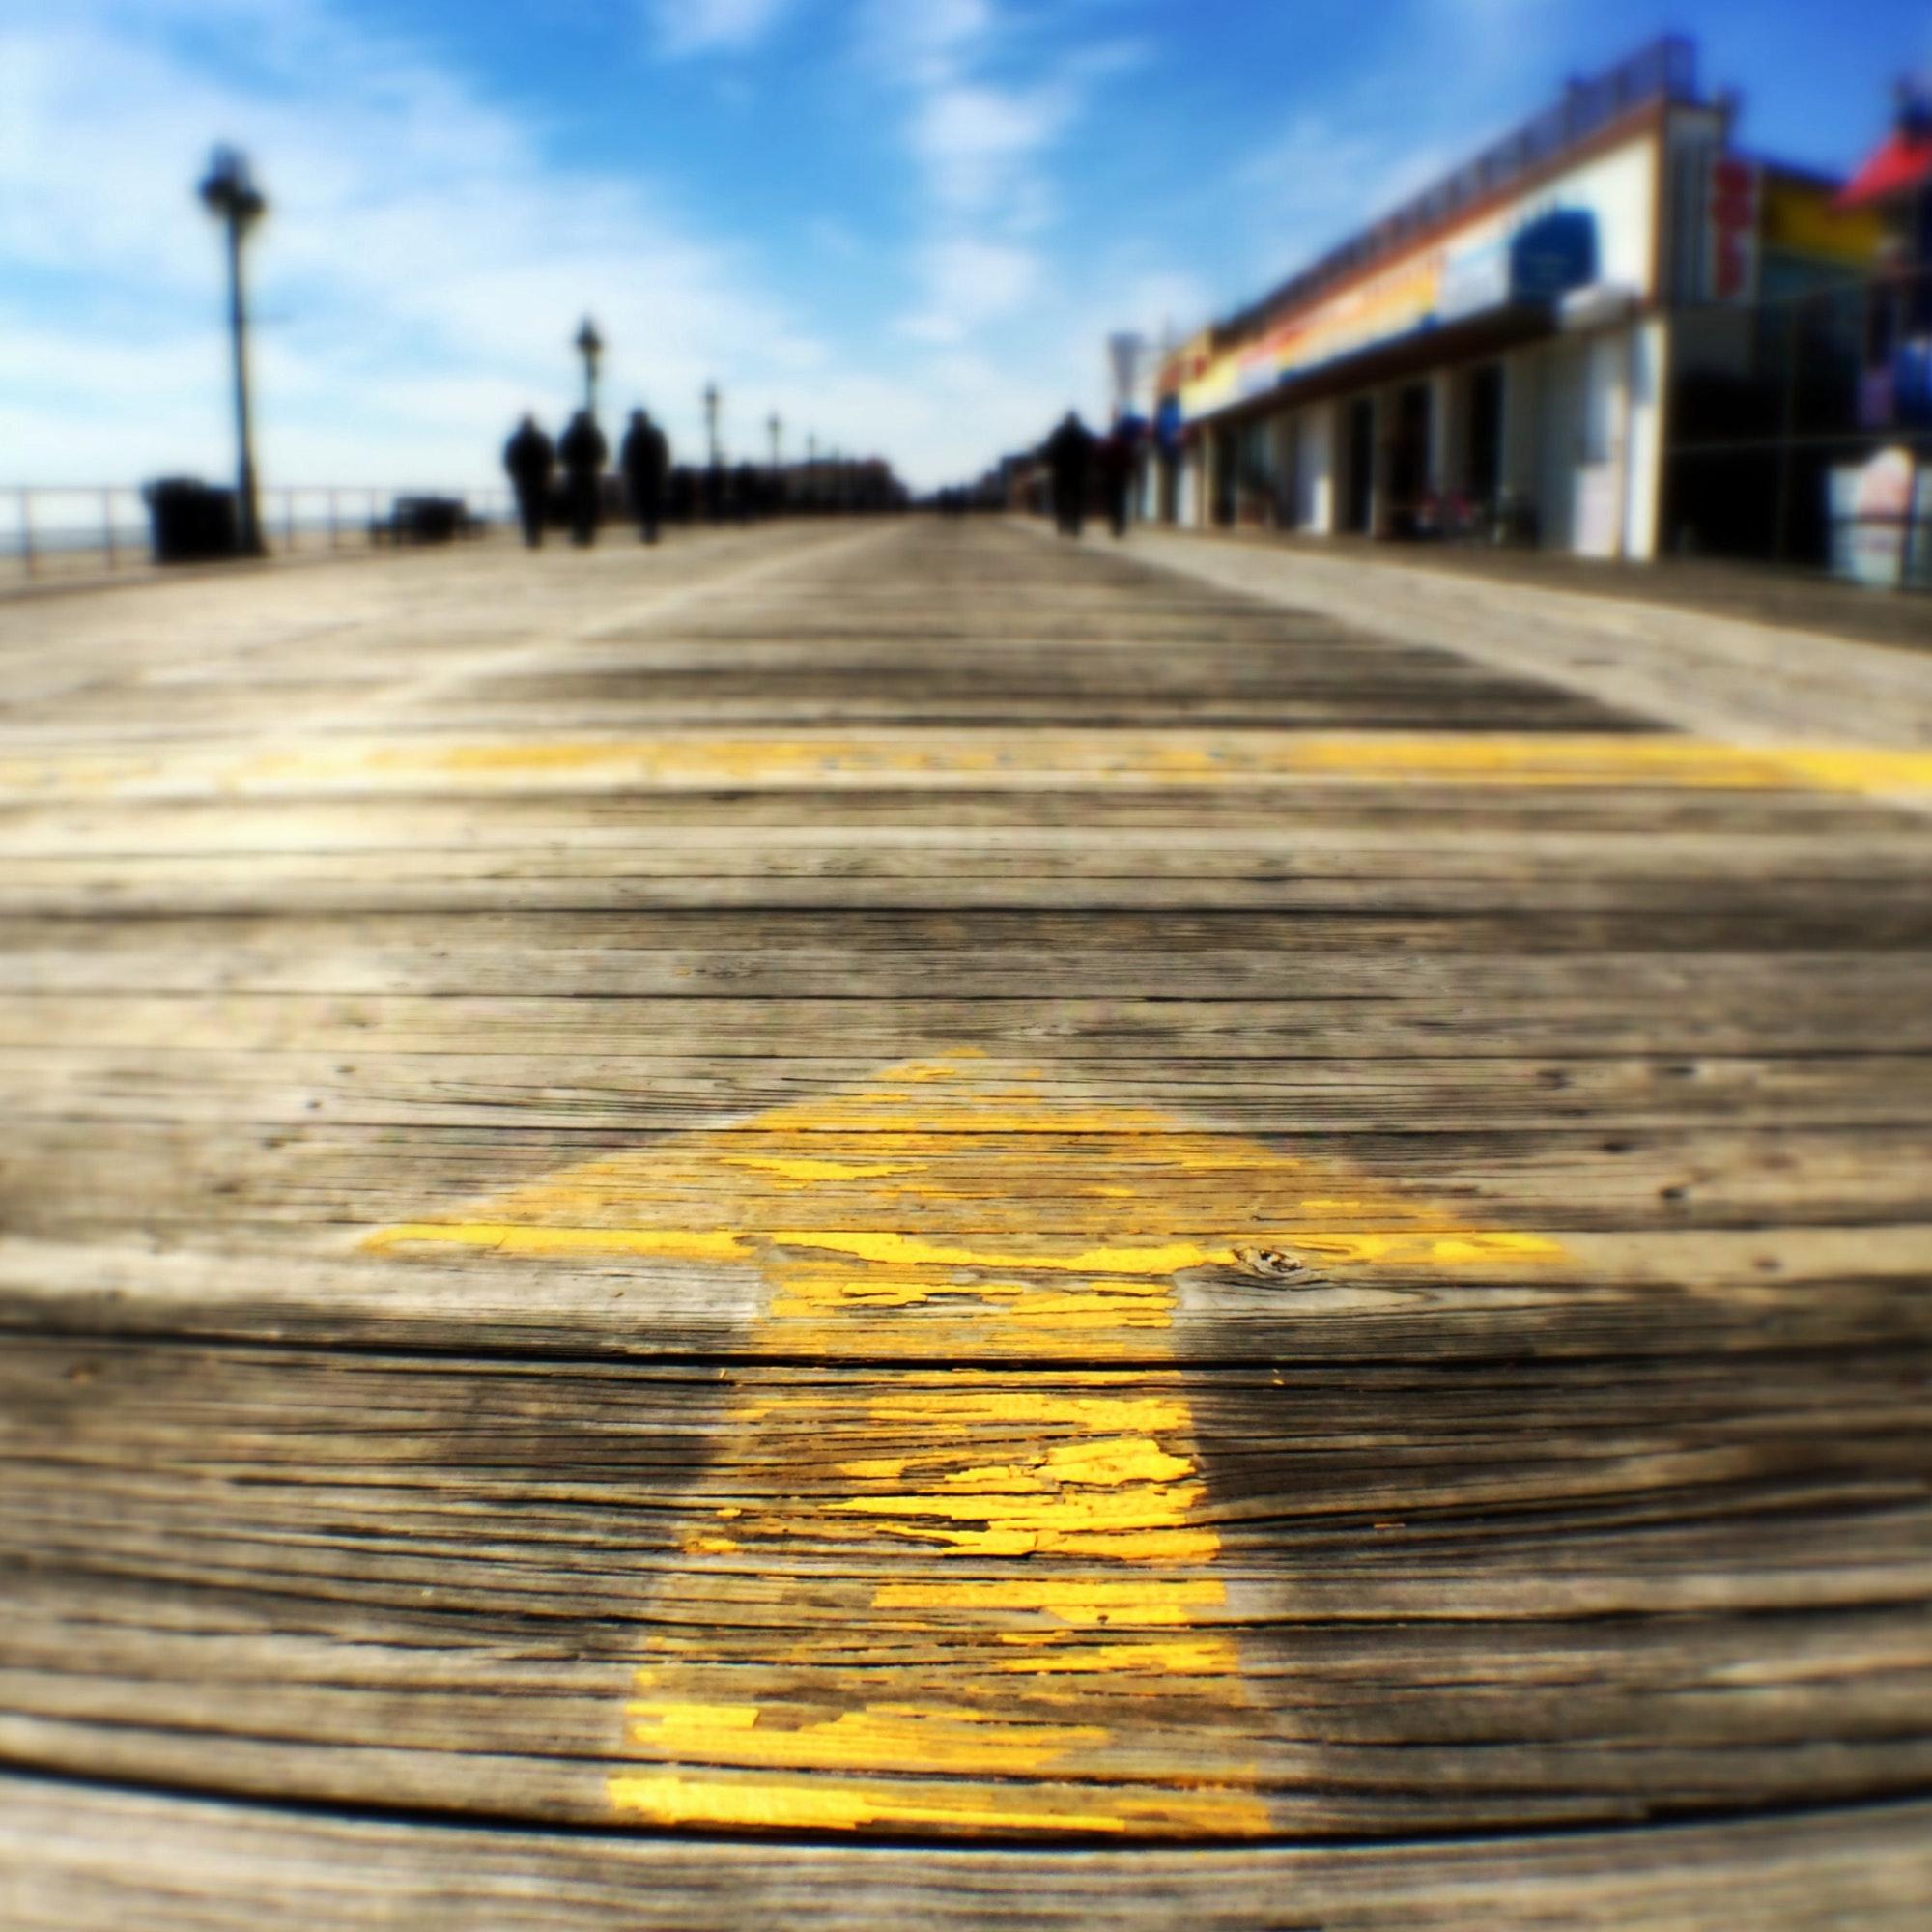 Arrow sign on wooden pier